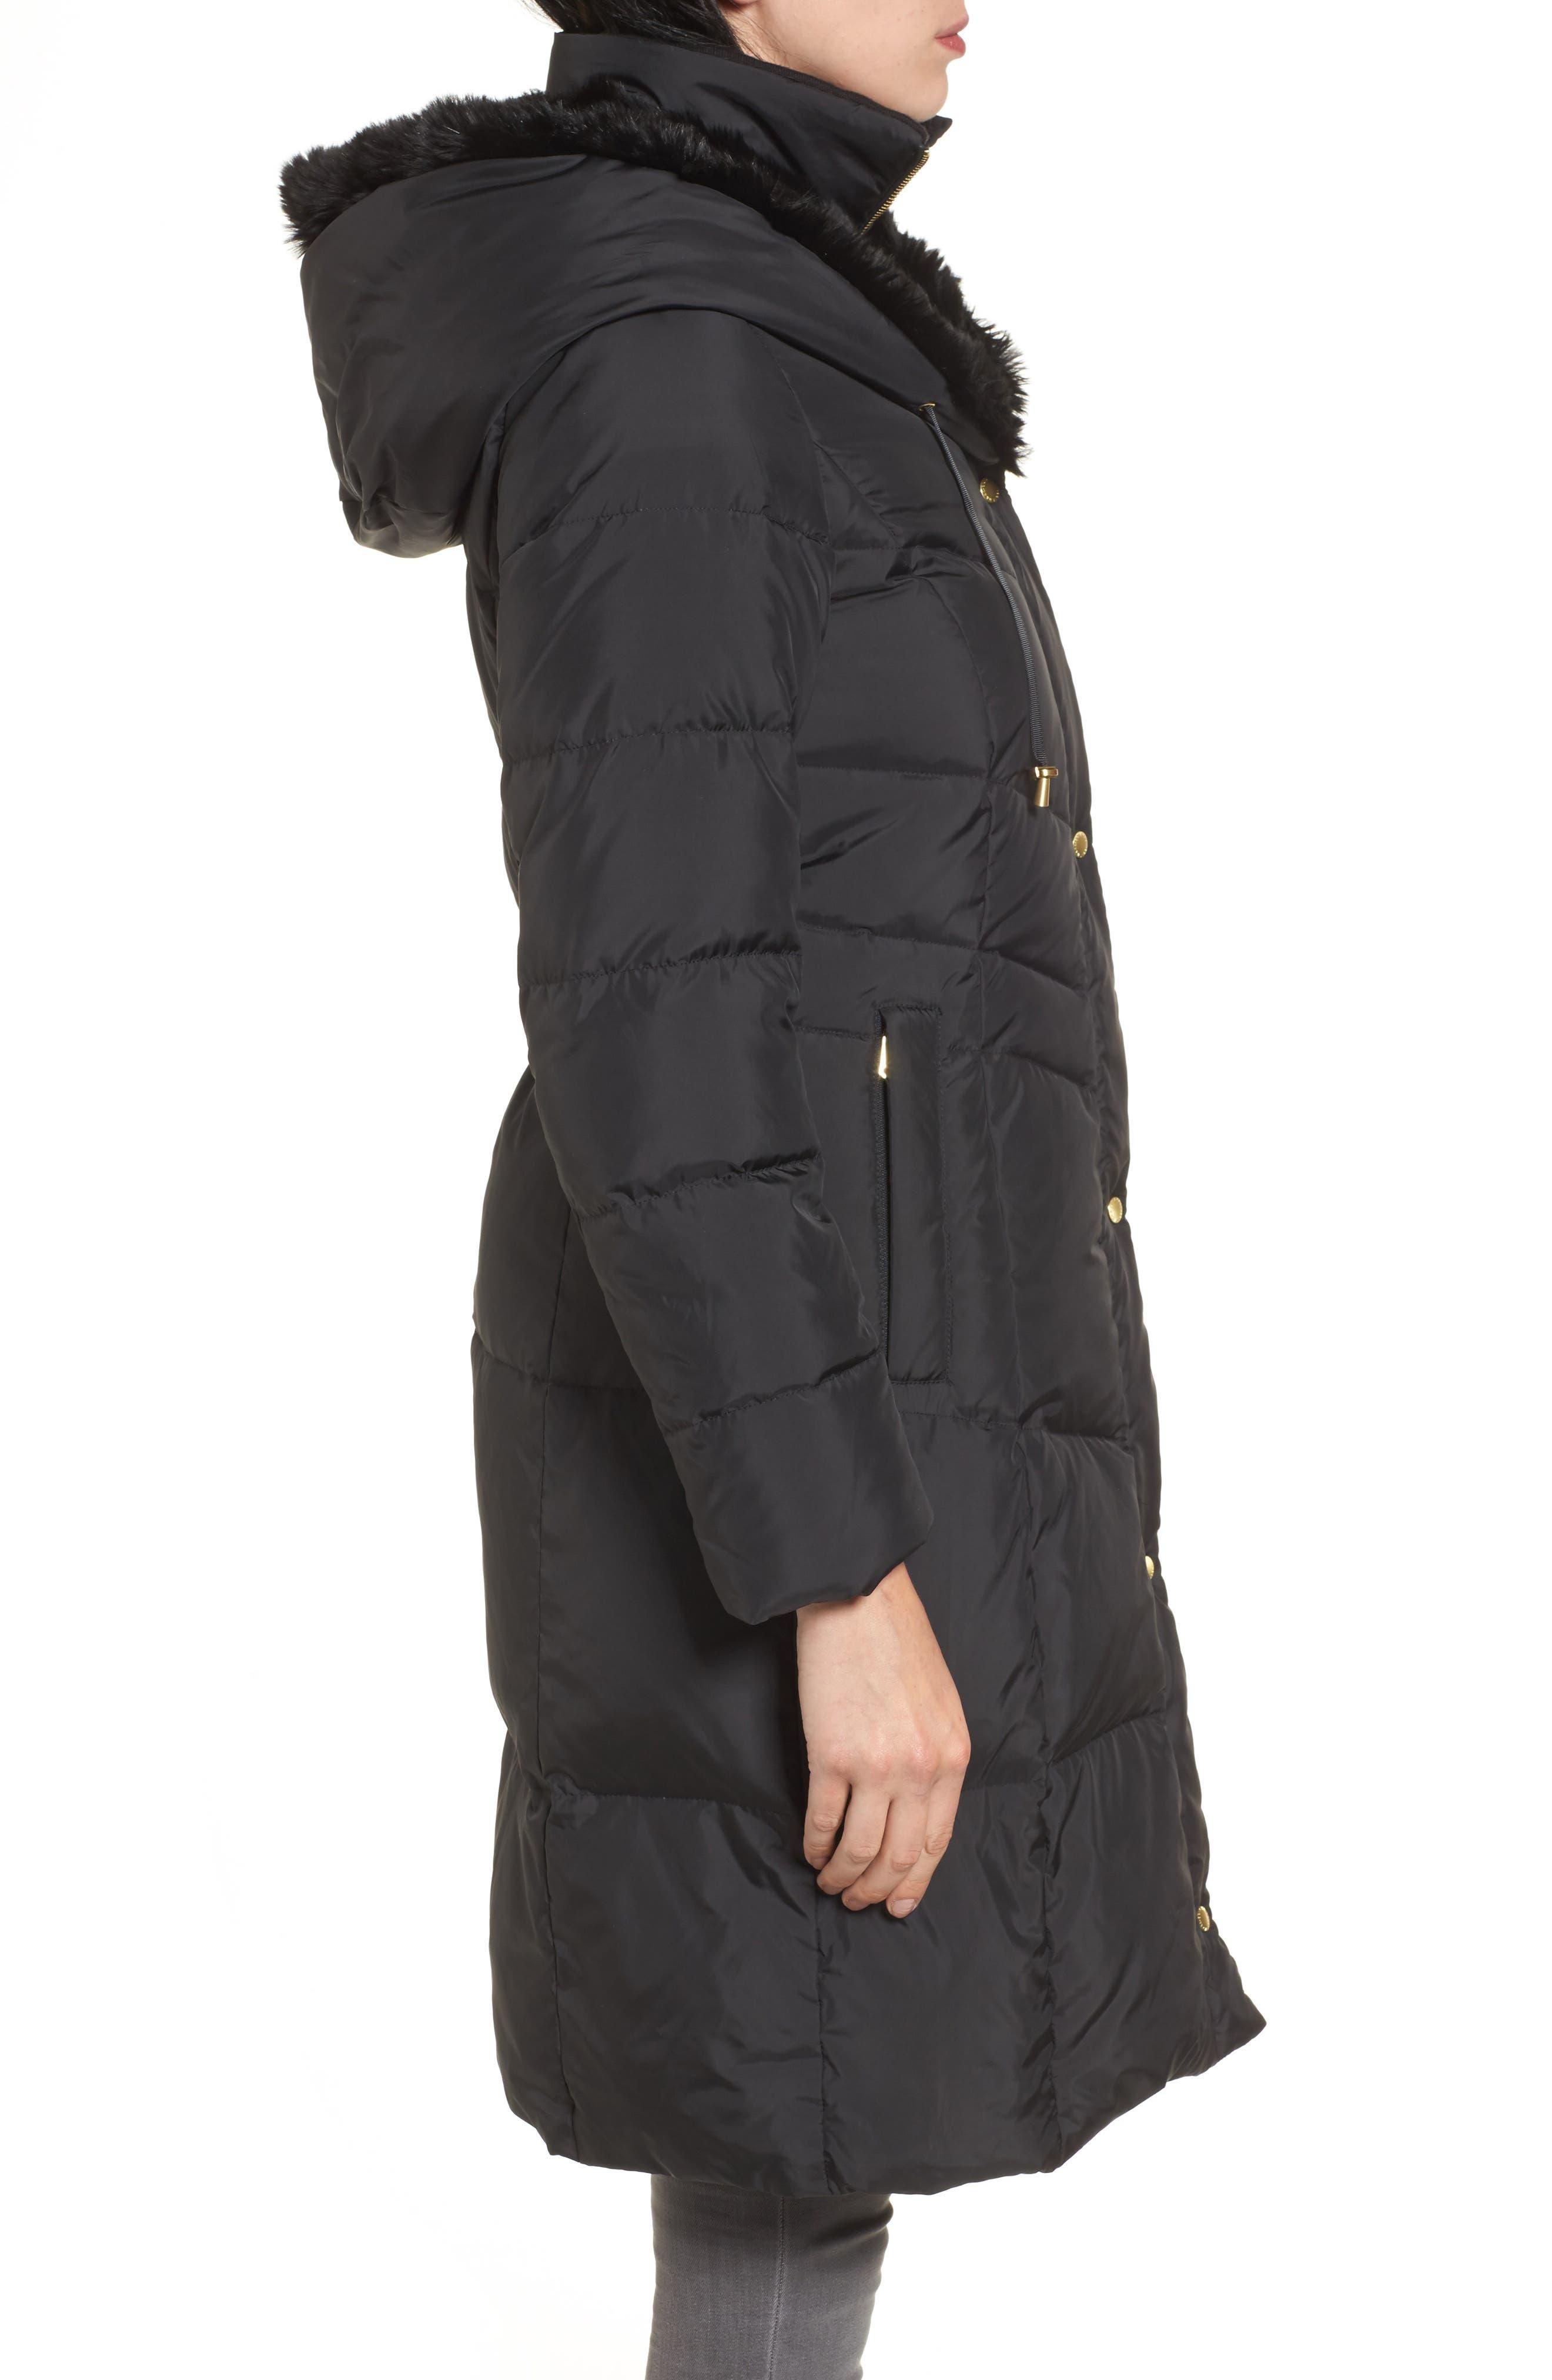 3/4 Down Coat with Faux Fur Hood,                             Alternate thumbnail 3, color,                             001